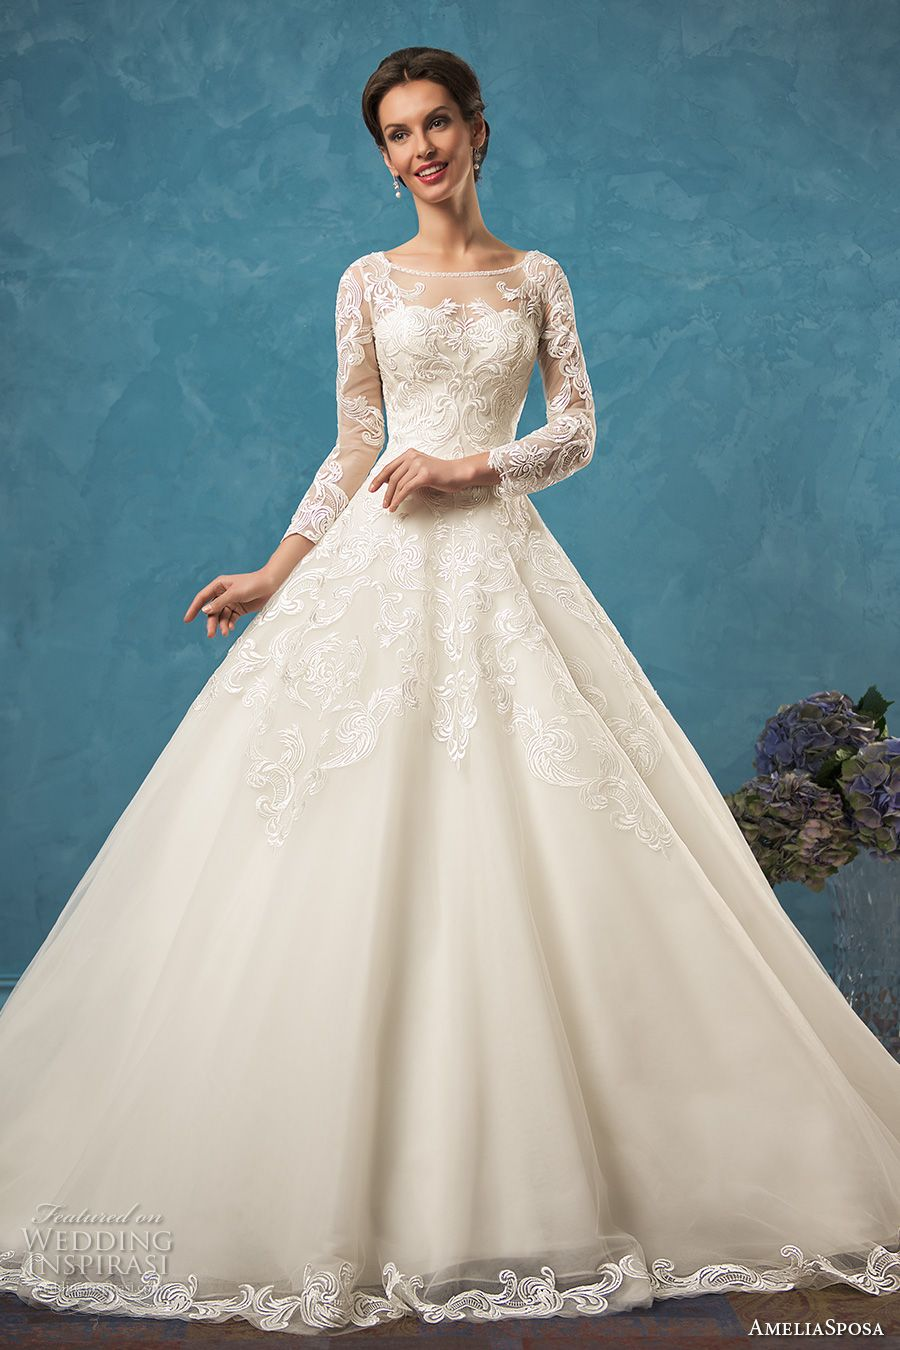 Amelia sposa 2017 wedding dresses amelia sposa lace bodice and amelia sposa 2017 wedding dresses ombrellifo Image collections